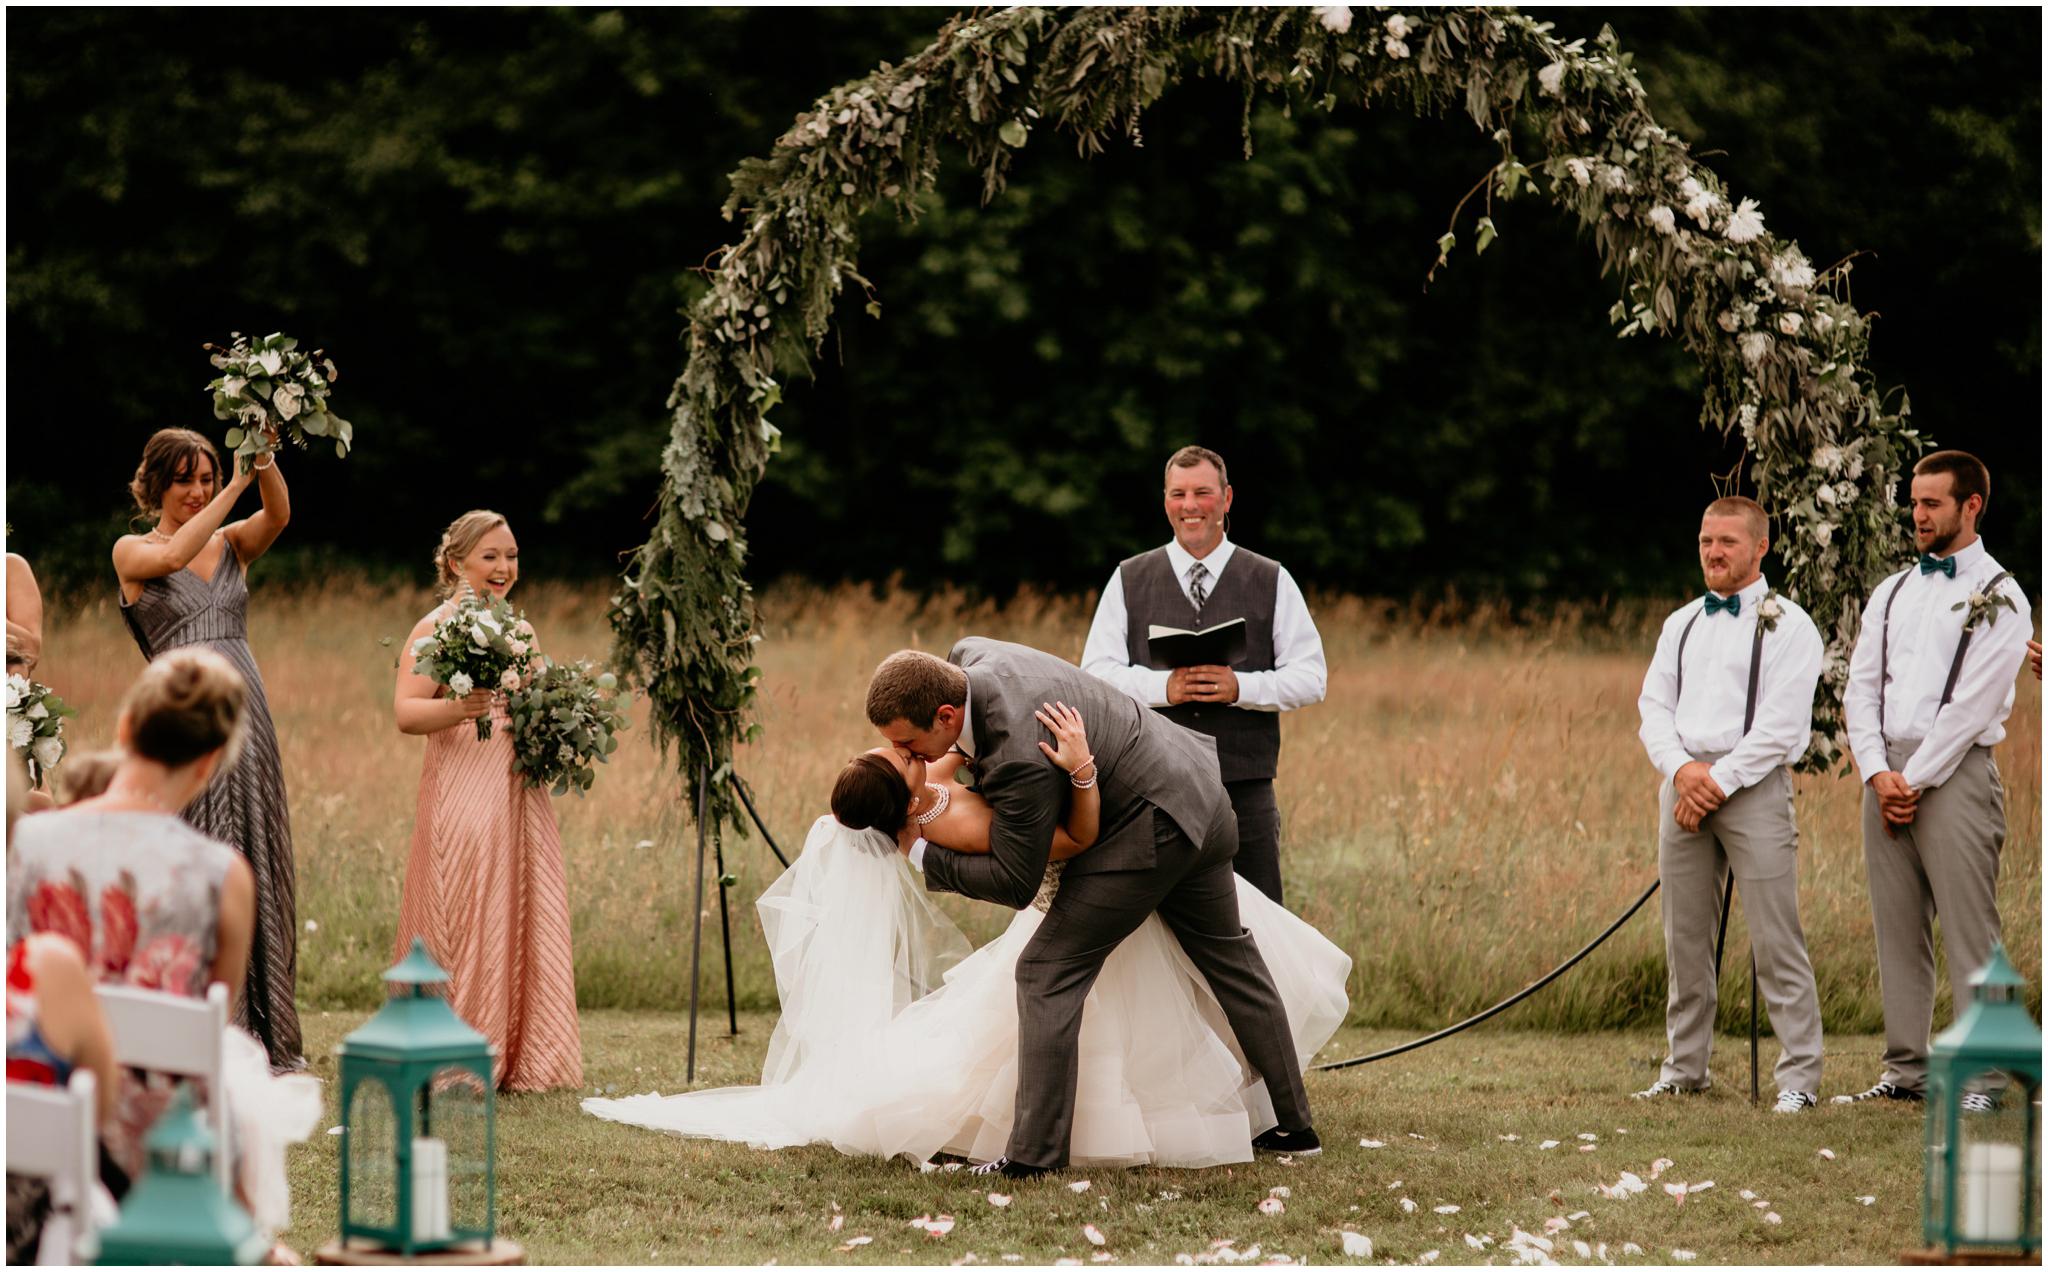 alex-and-matthew-three-cs-farm-venue-seattle-wedding-photographer-111.jpg